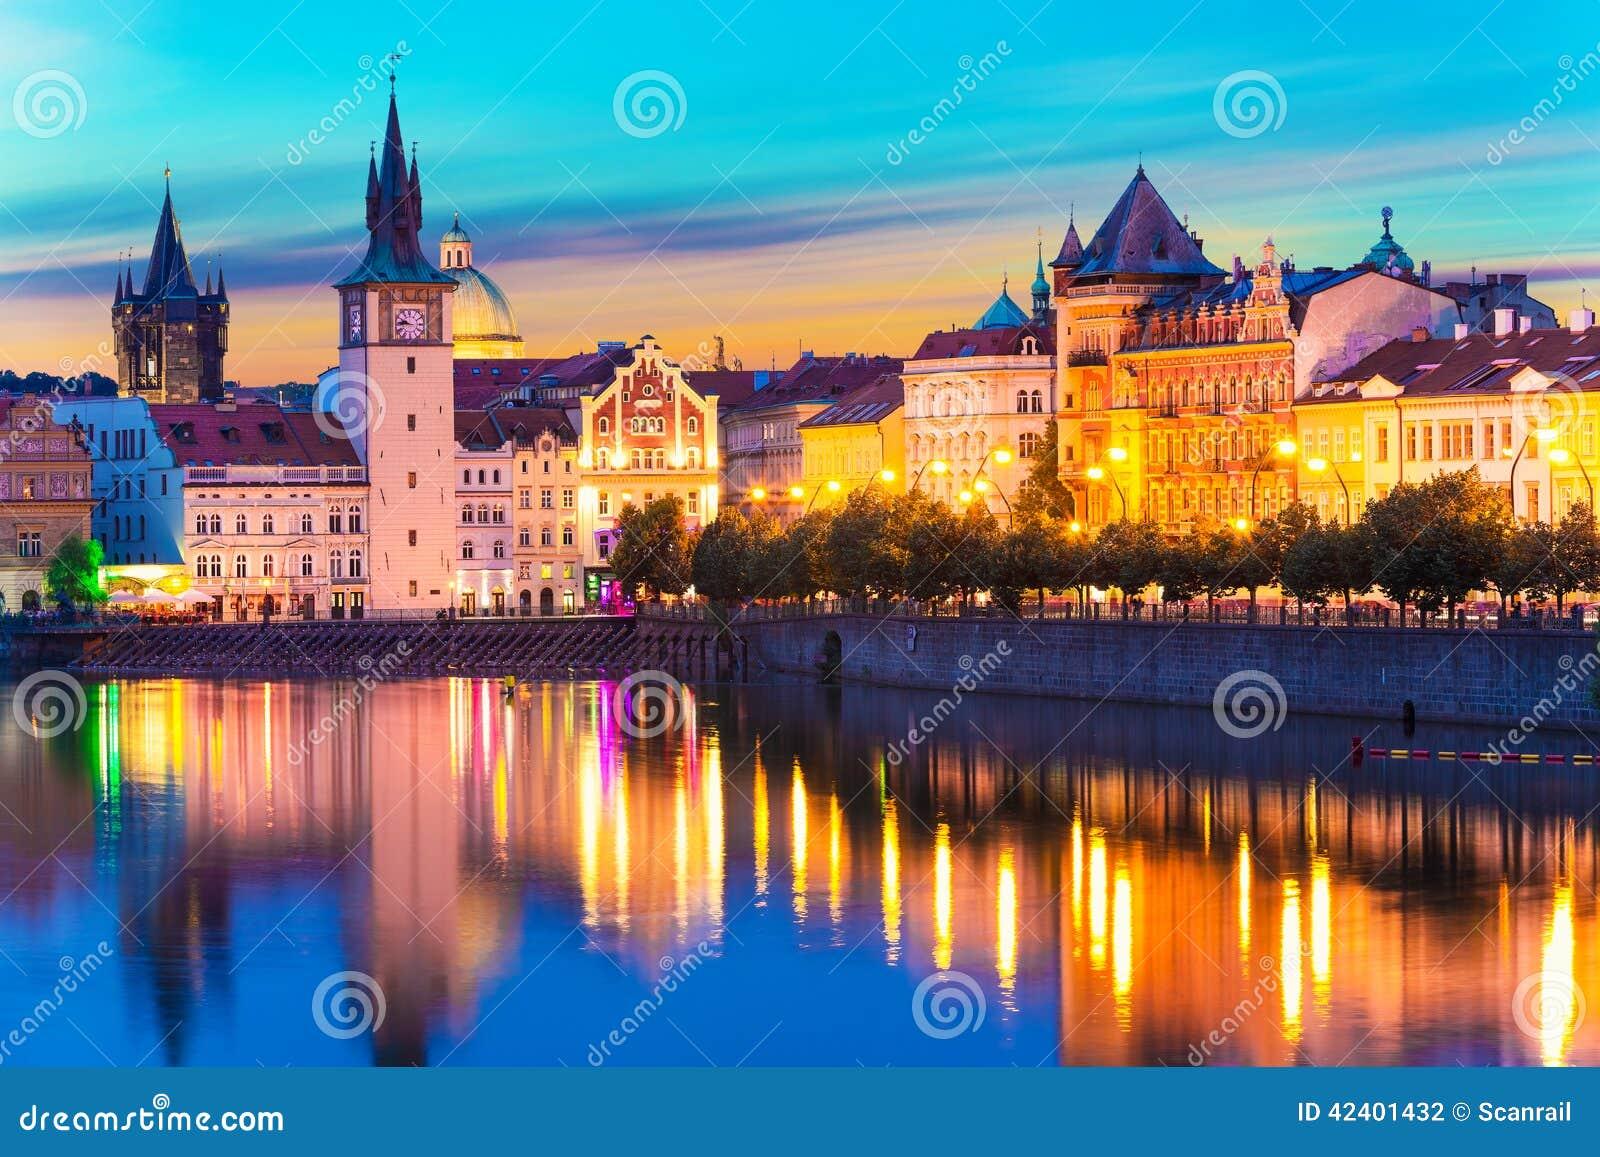 Old Town in Prague, Czech Republic